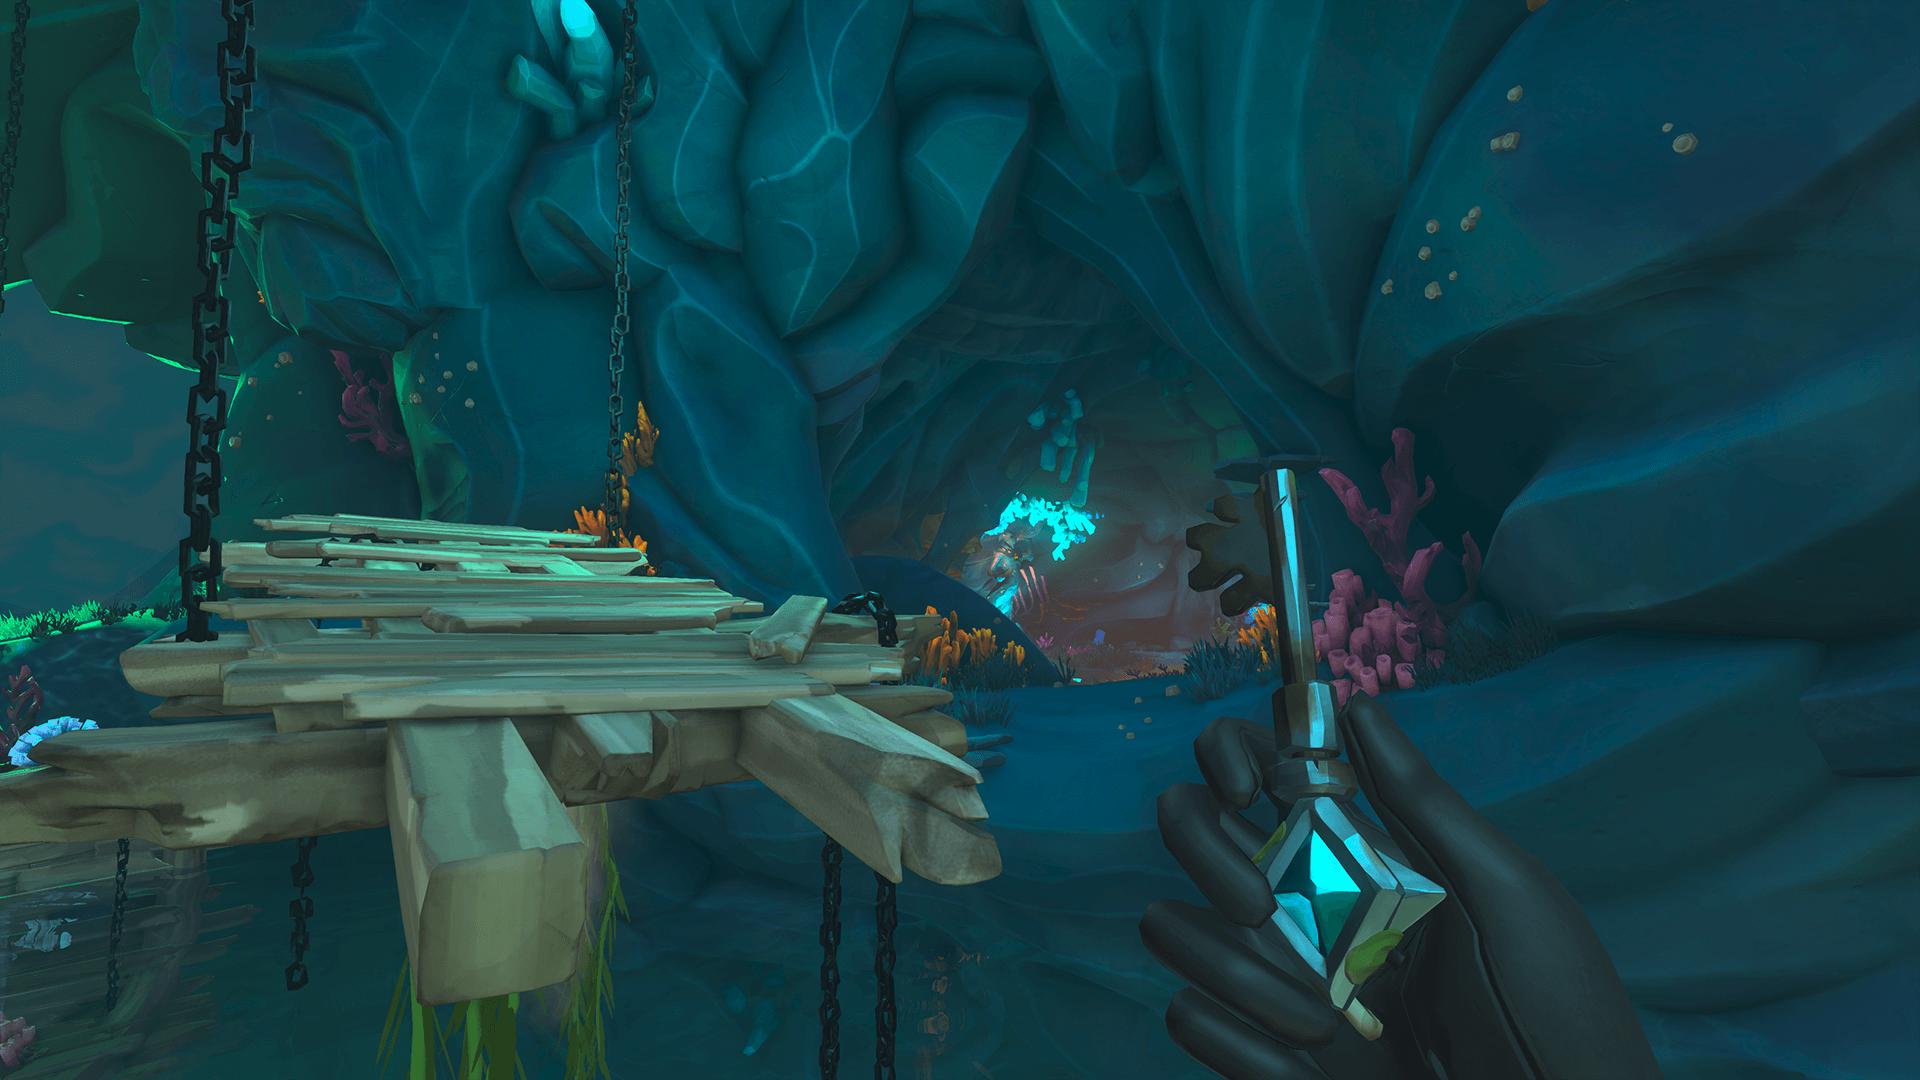 Citadel-Cavern 4-Cross the Platform Again